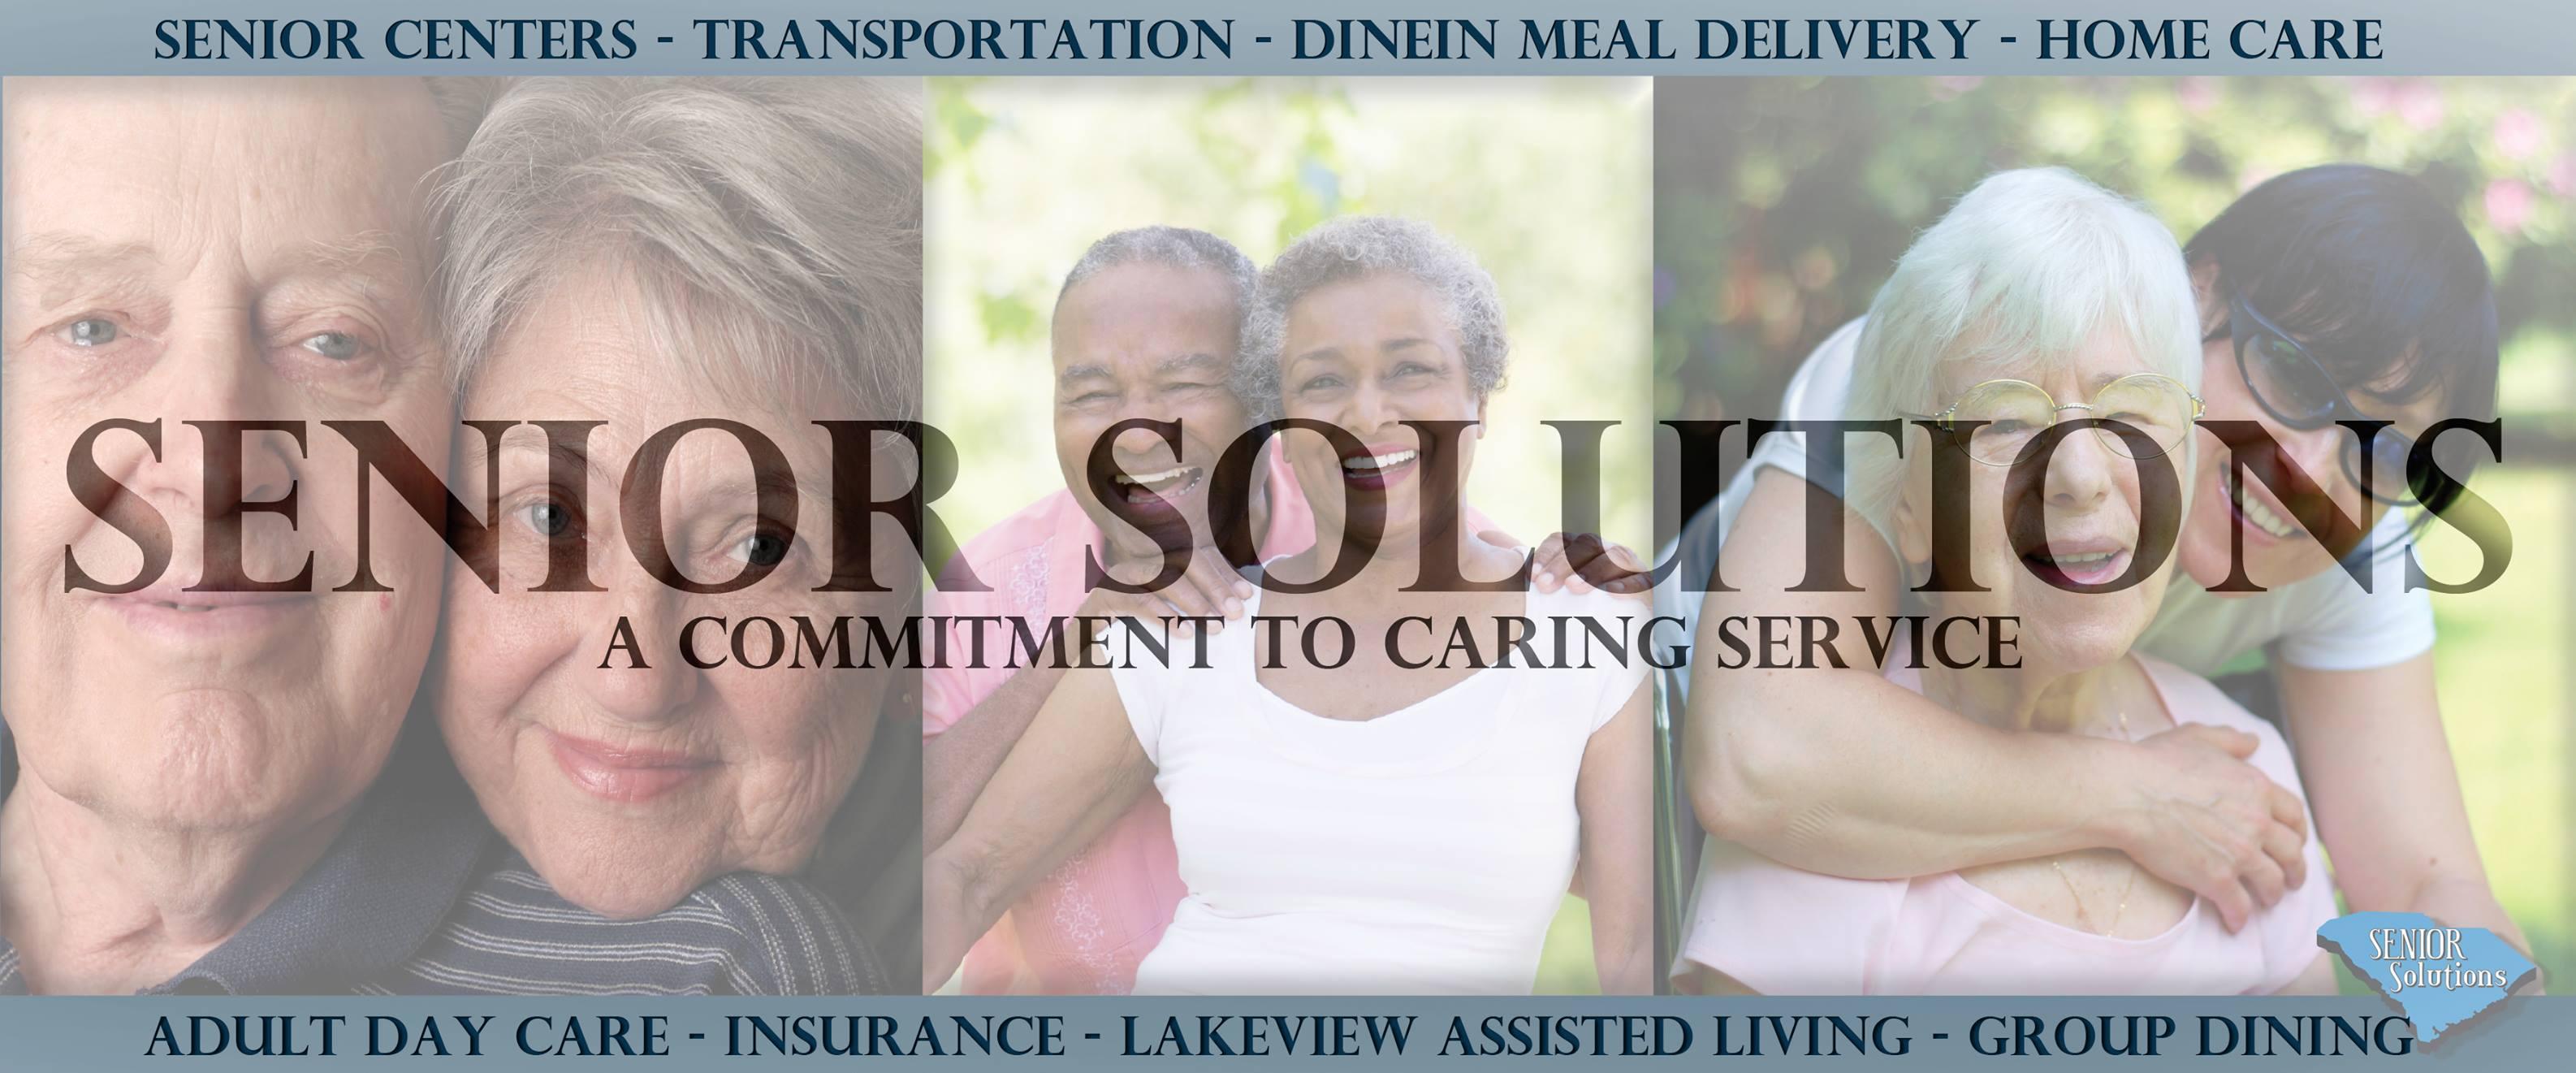 South Carolina's Top Rated Local® Senior Living Communities Award Winner: SENIOR Solutions